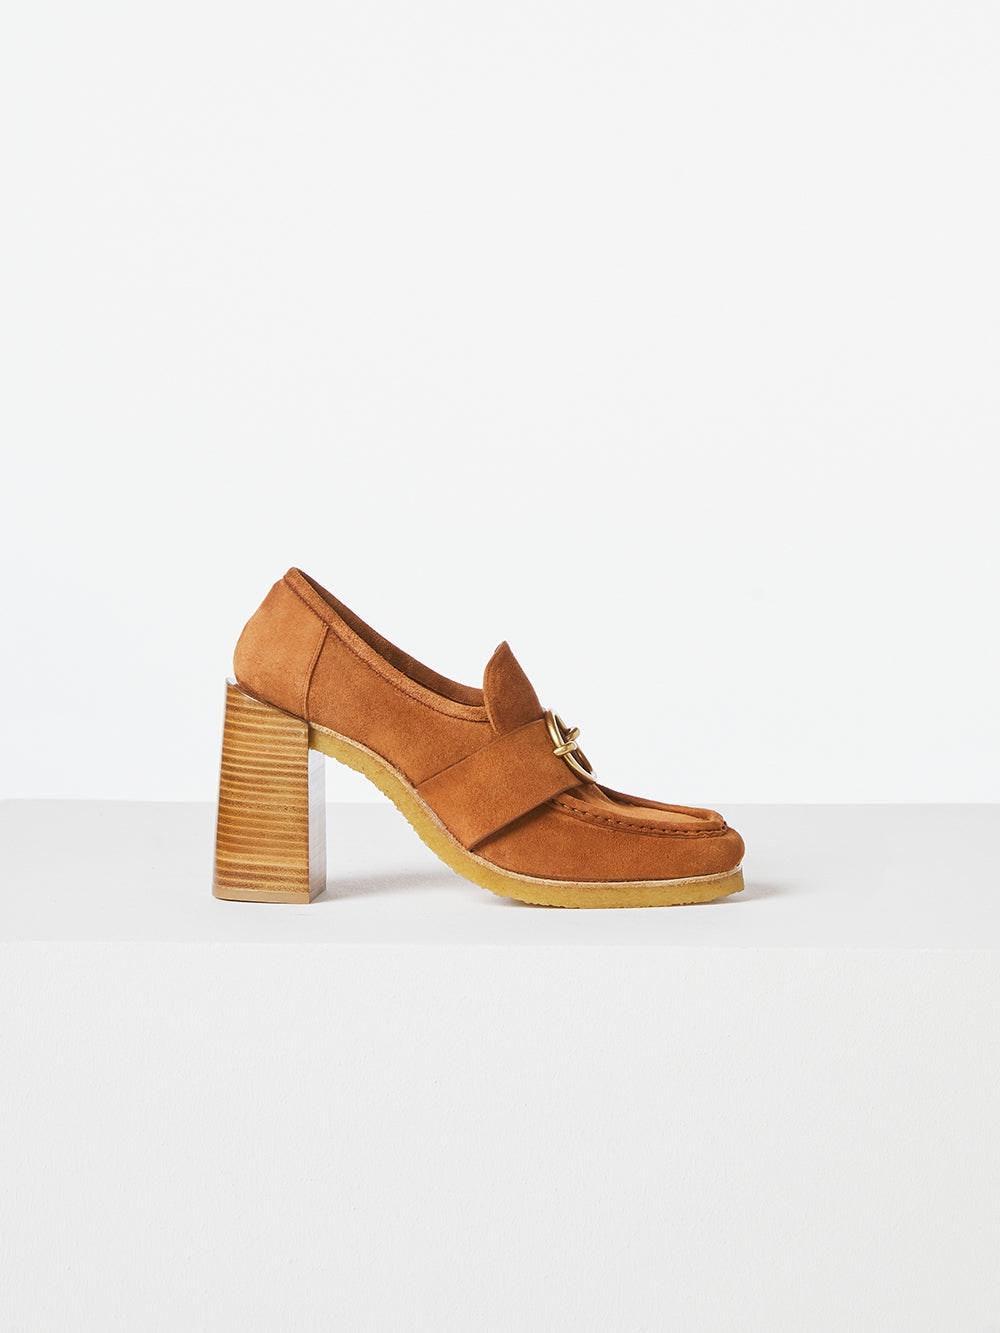 shoe side view alt:hover